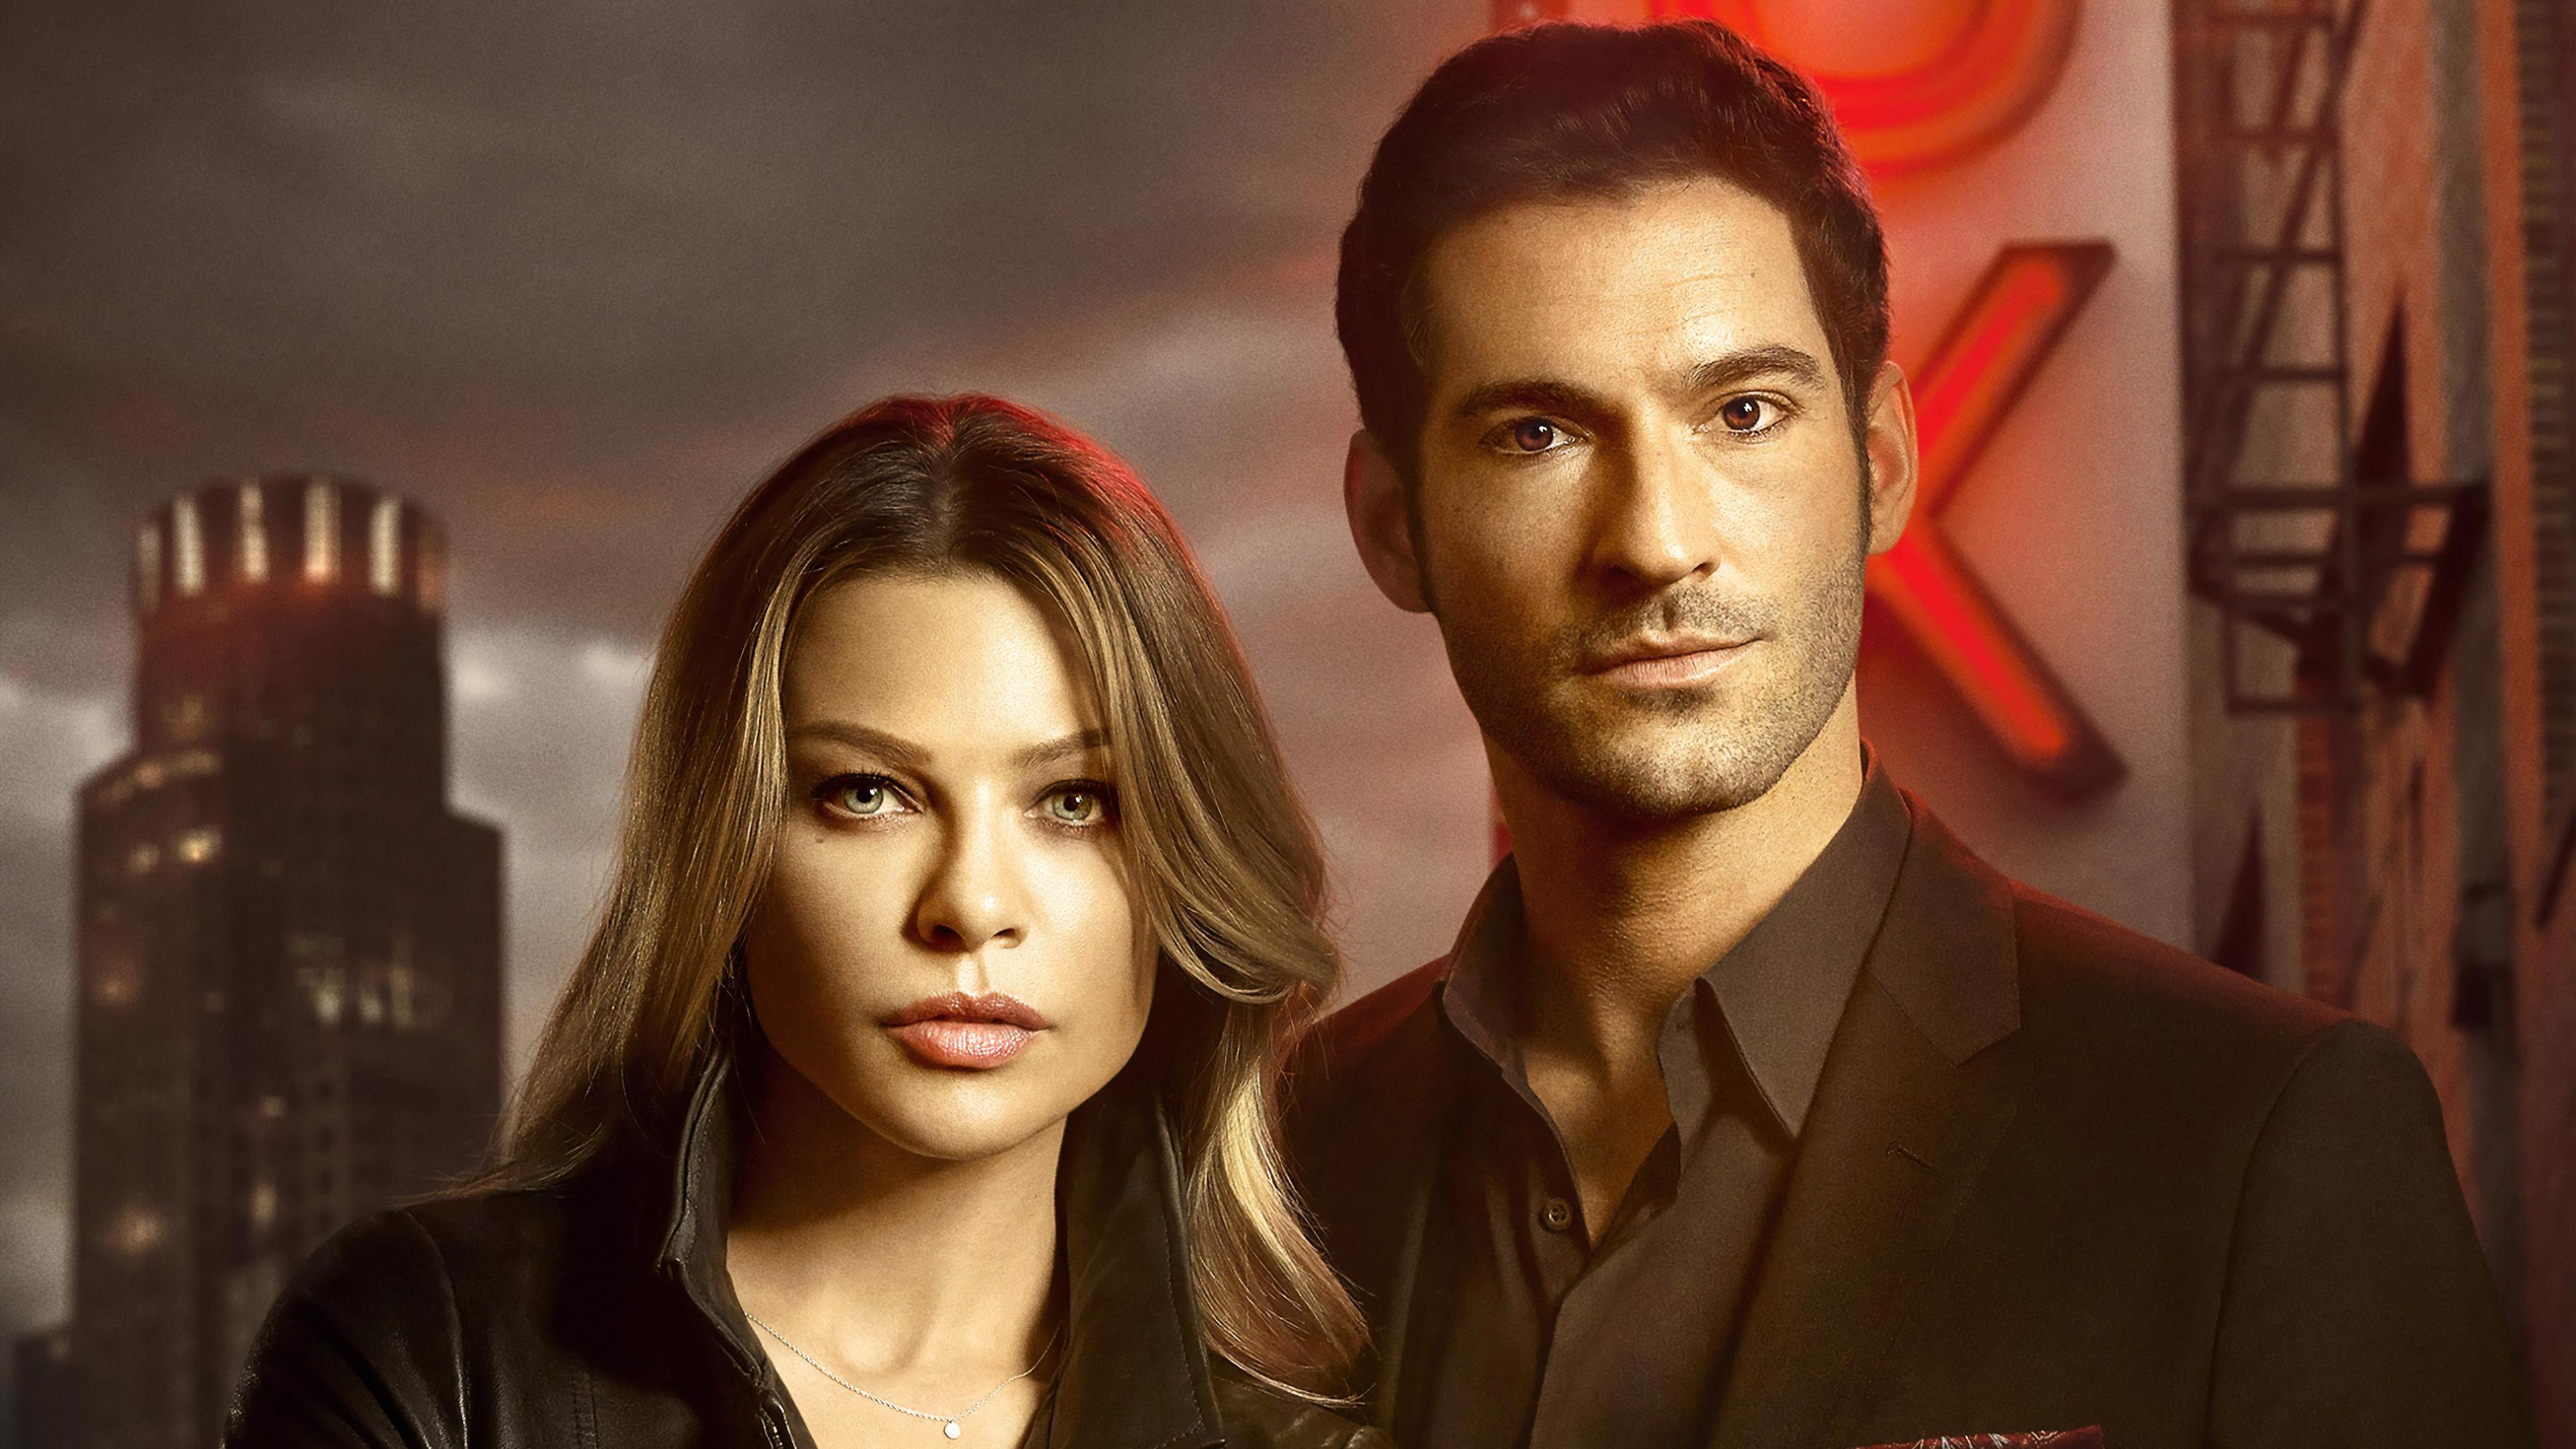 lucifer season 4 1577914117 - Lucifer Season 4 - Lucifer Season 4 4k wallpaper